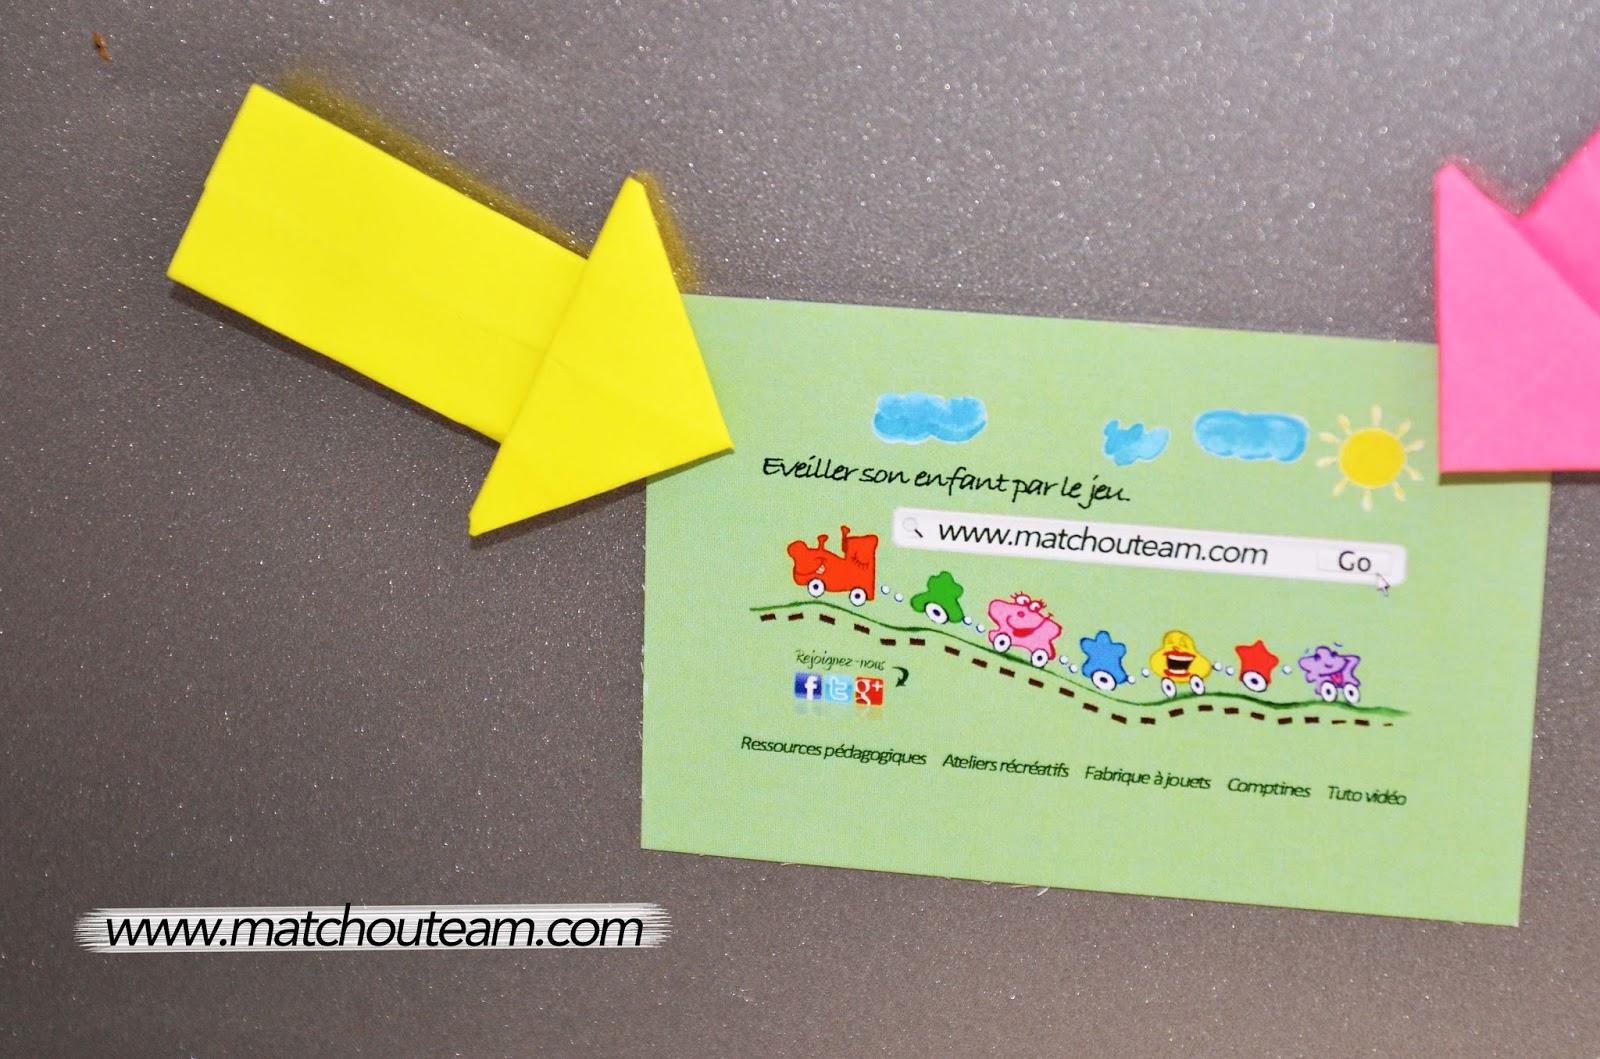 origami transformer un post-it en flèche